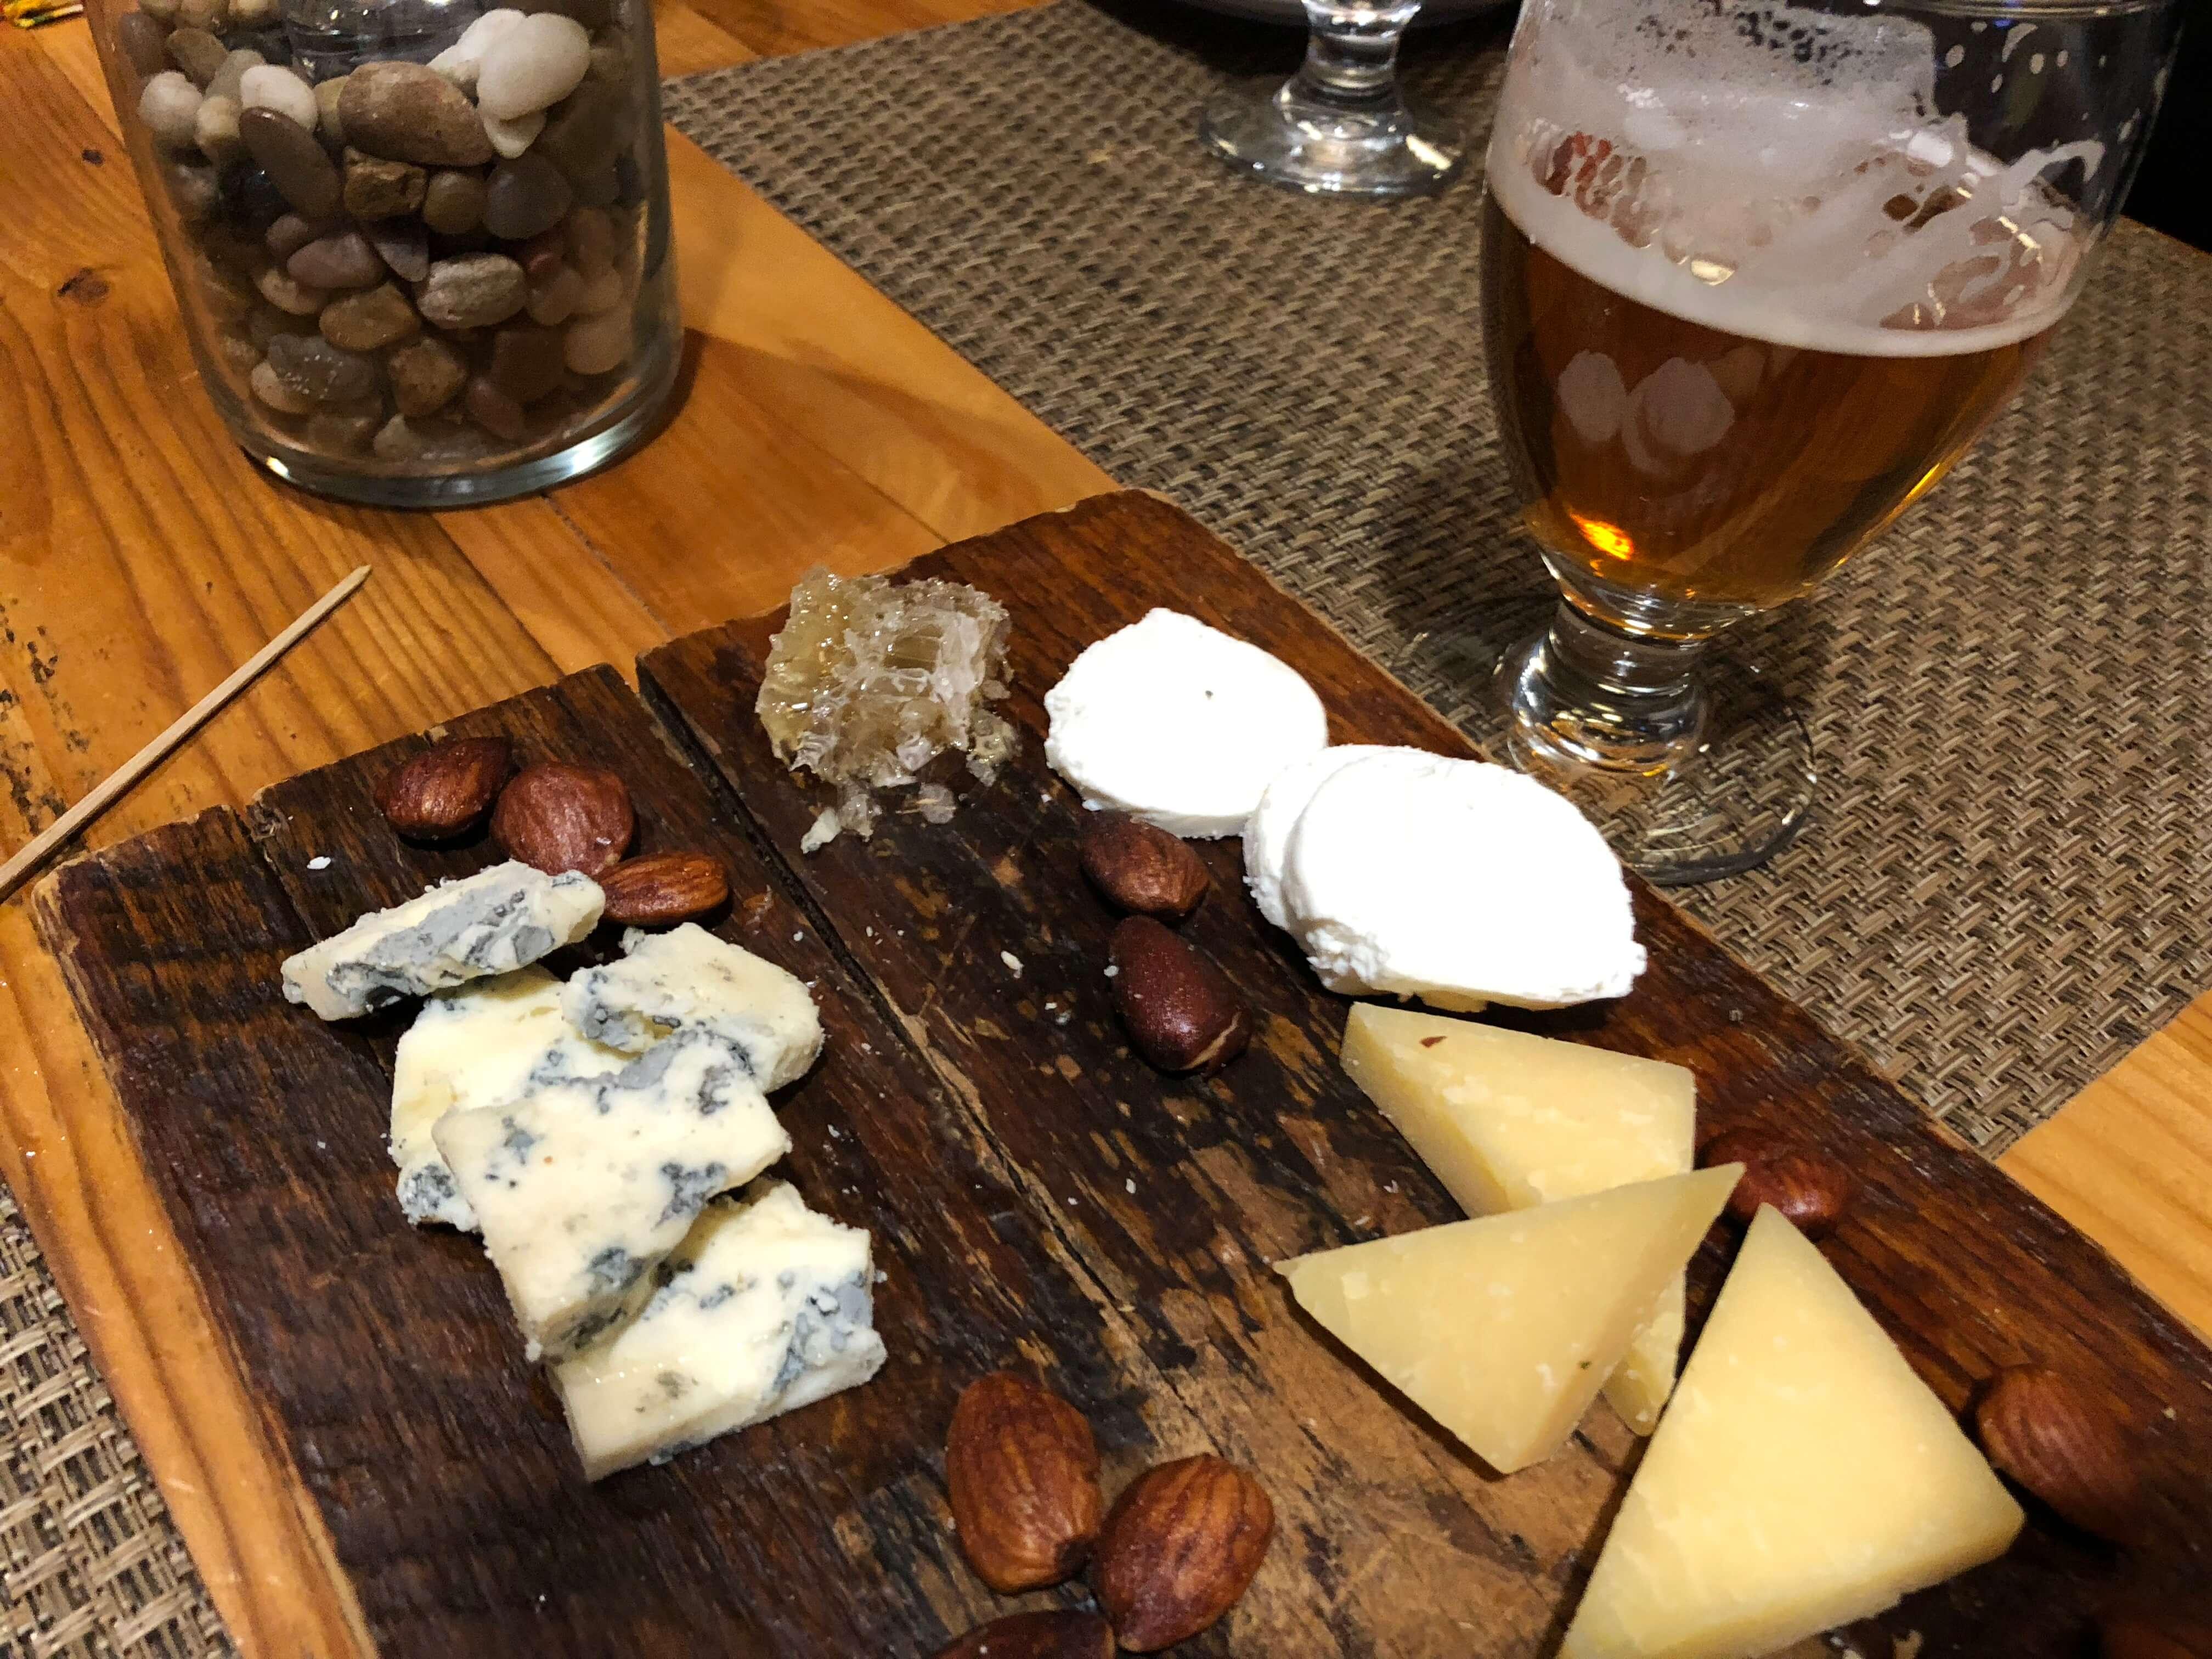 Killington Resort learn to ski program cheese platter